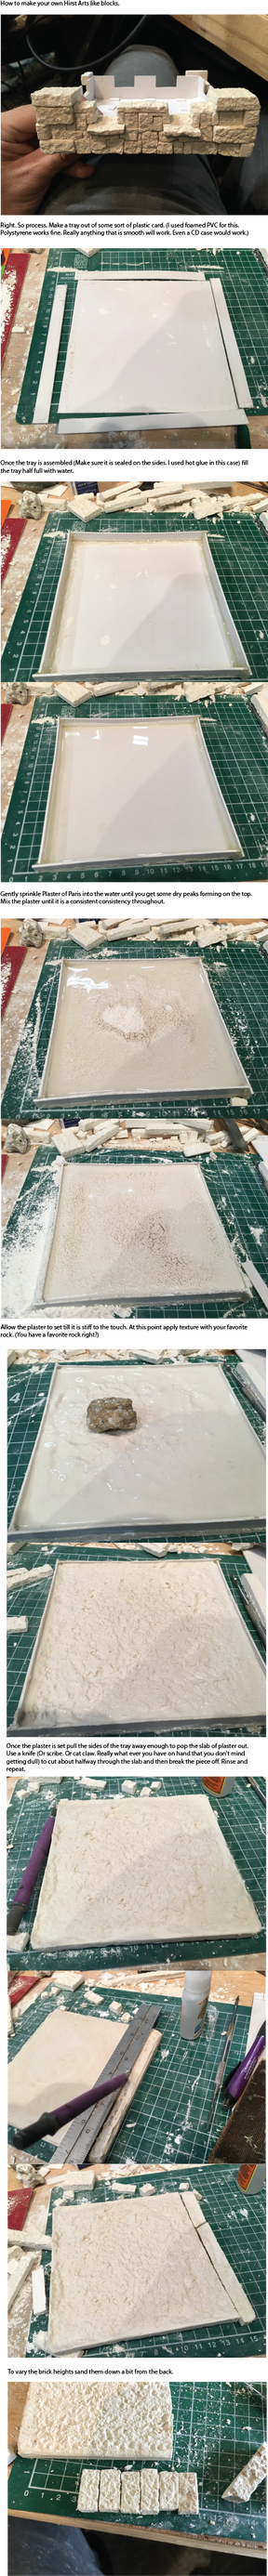 Tutorial on making Plaster of Paris Blocks by TheBugKing